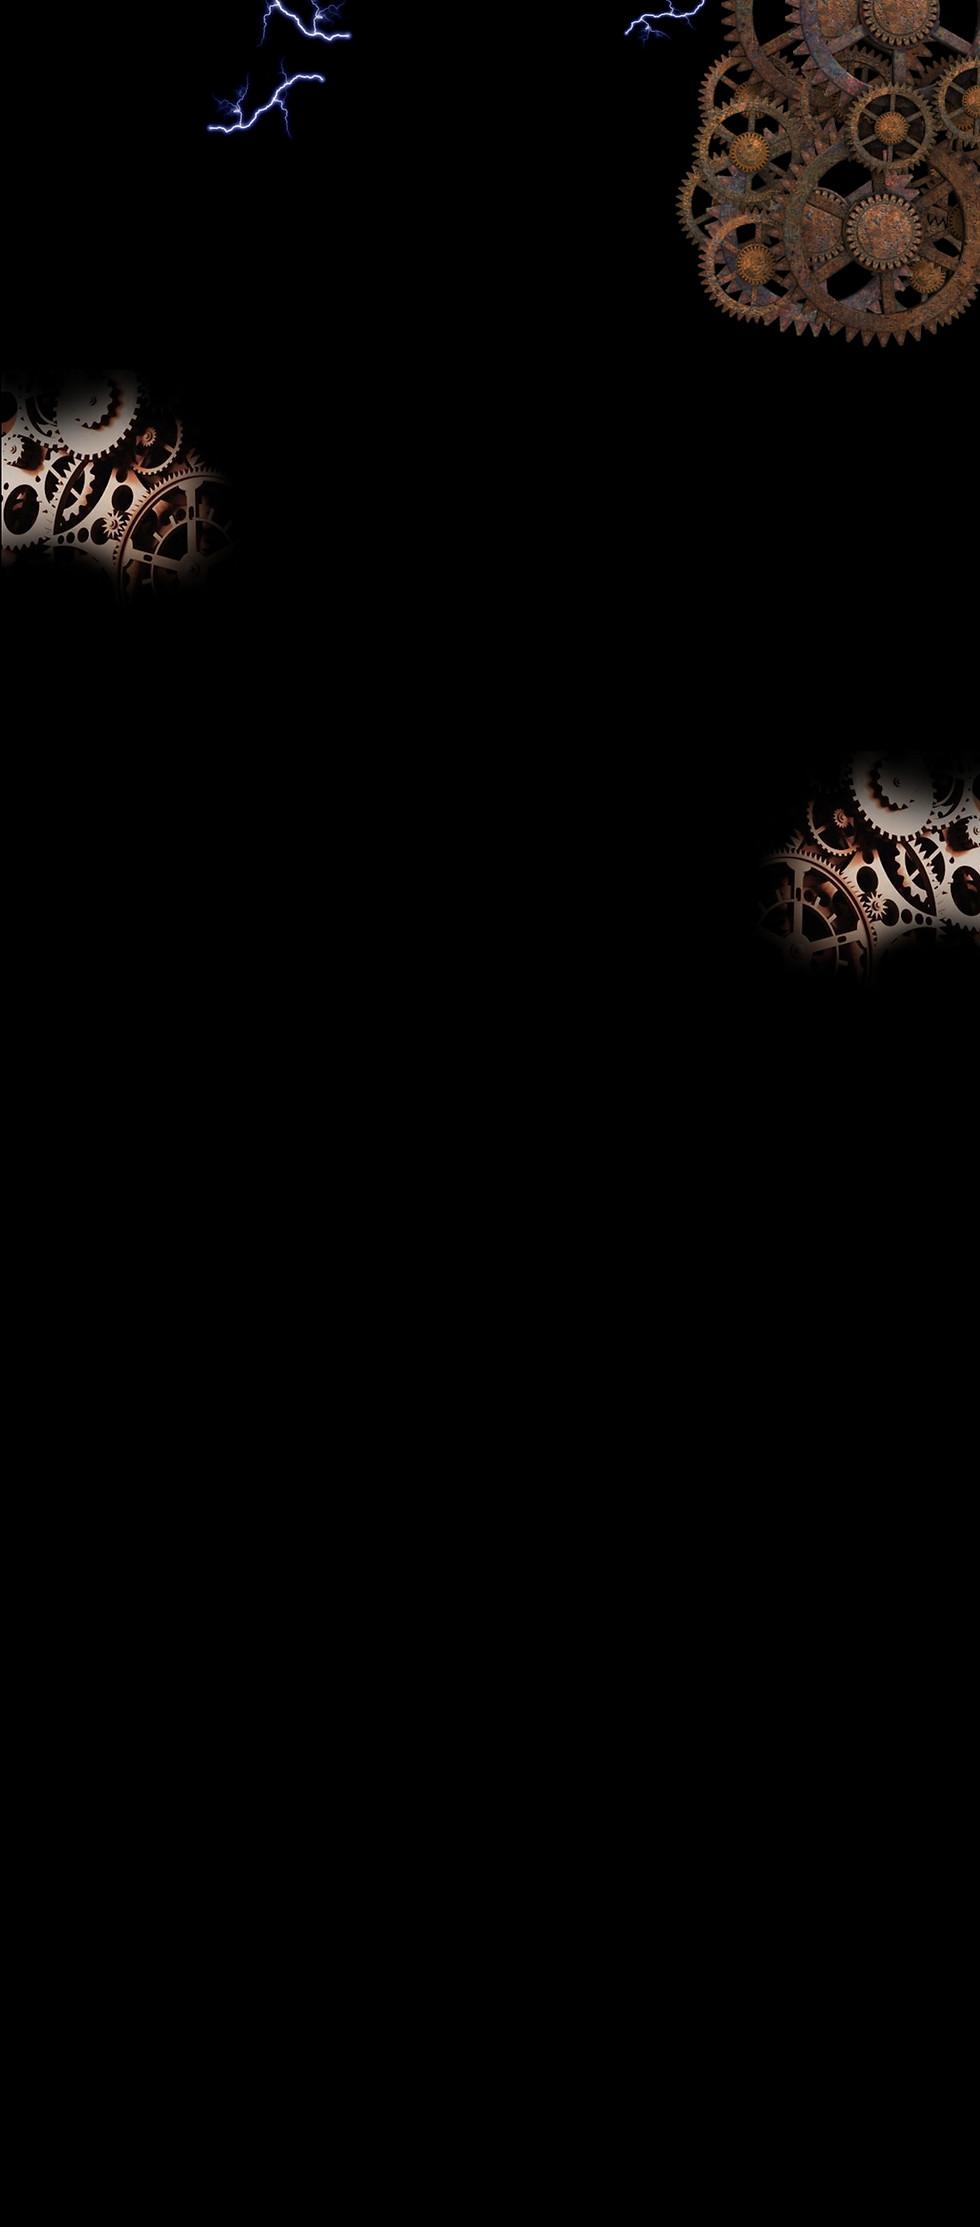 black background6.jpg